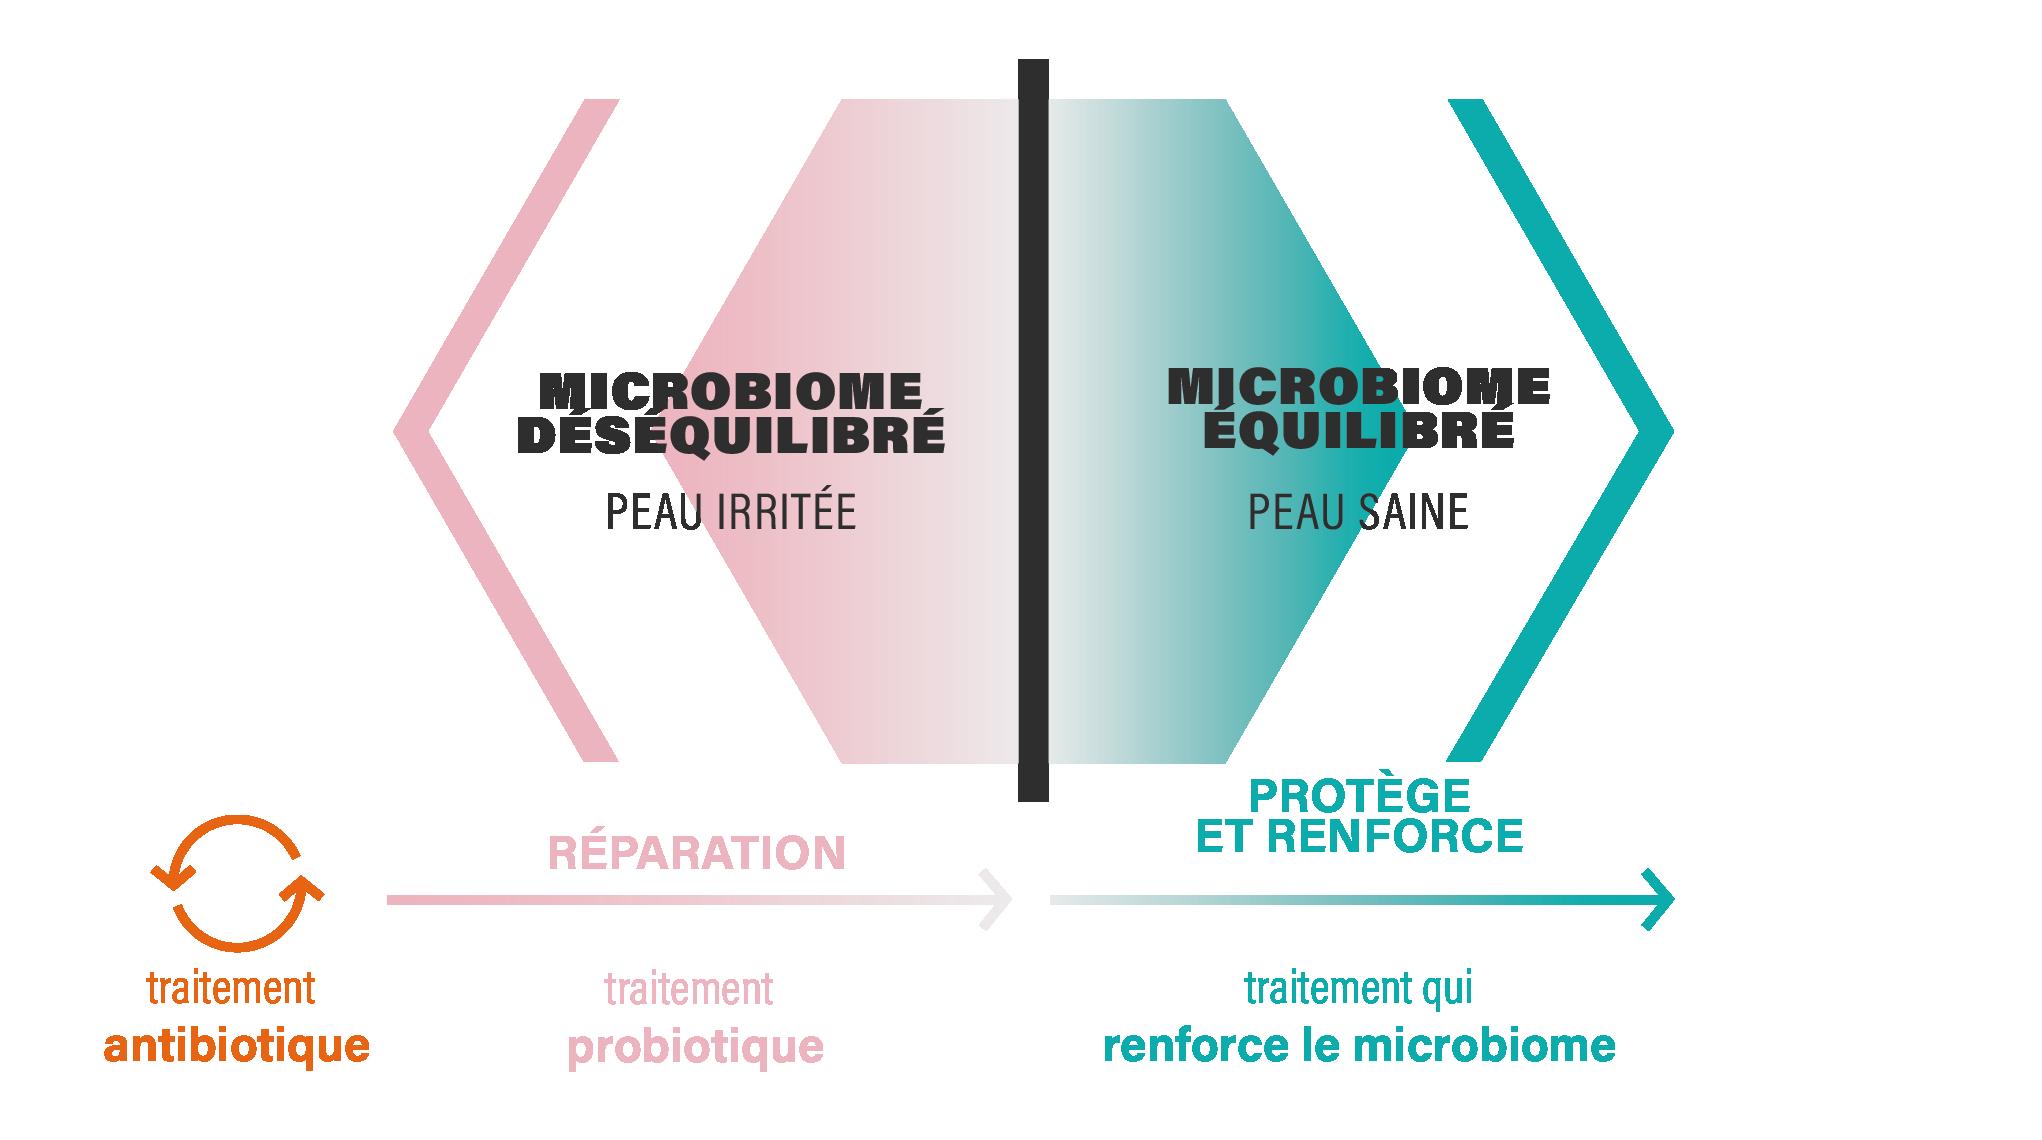 BALANCED MICROBIOME_Fr@4x